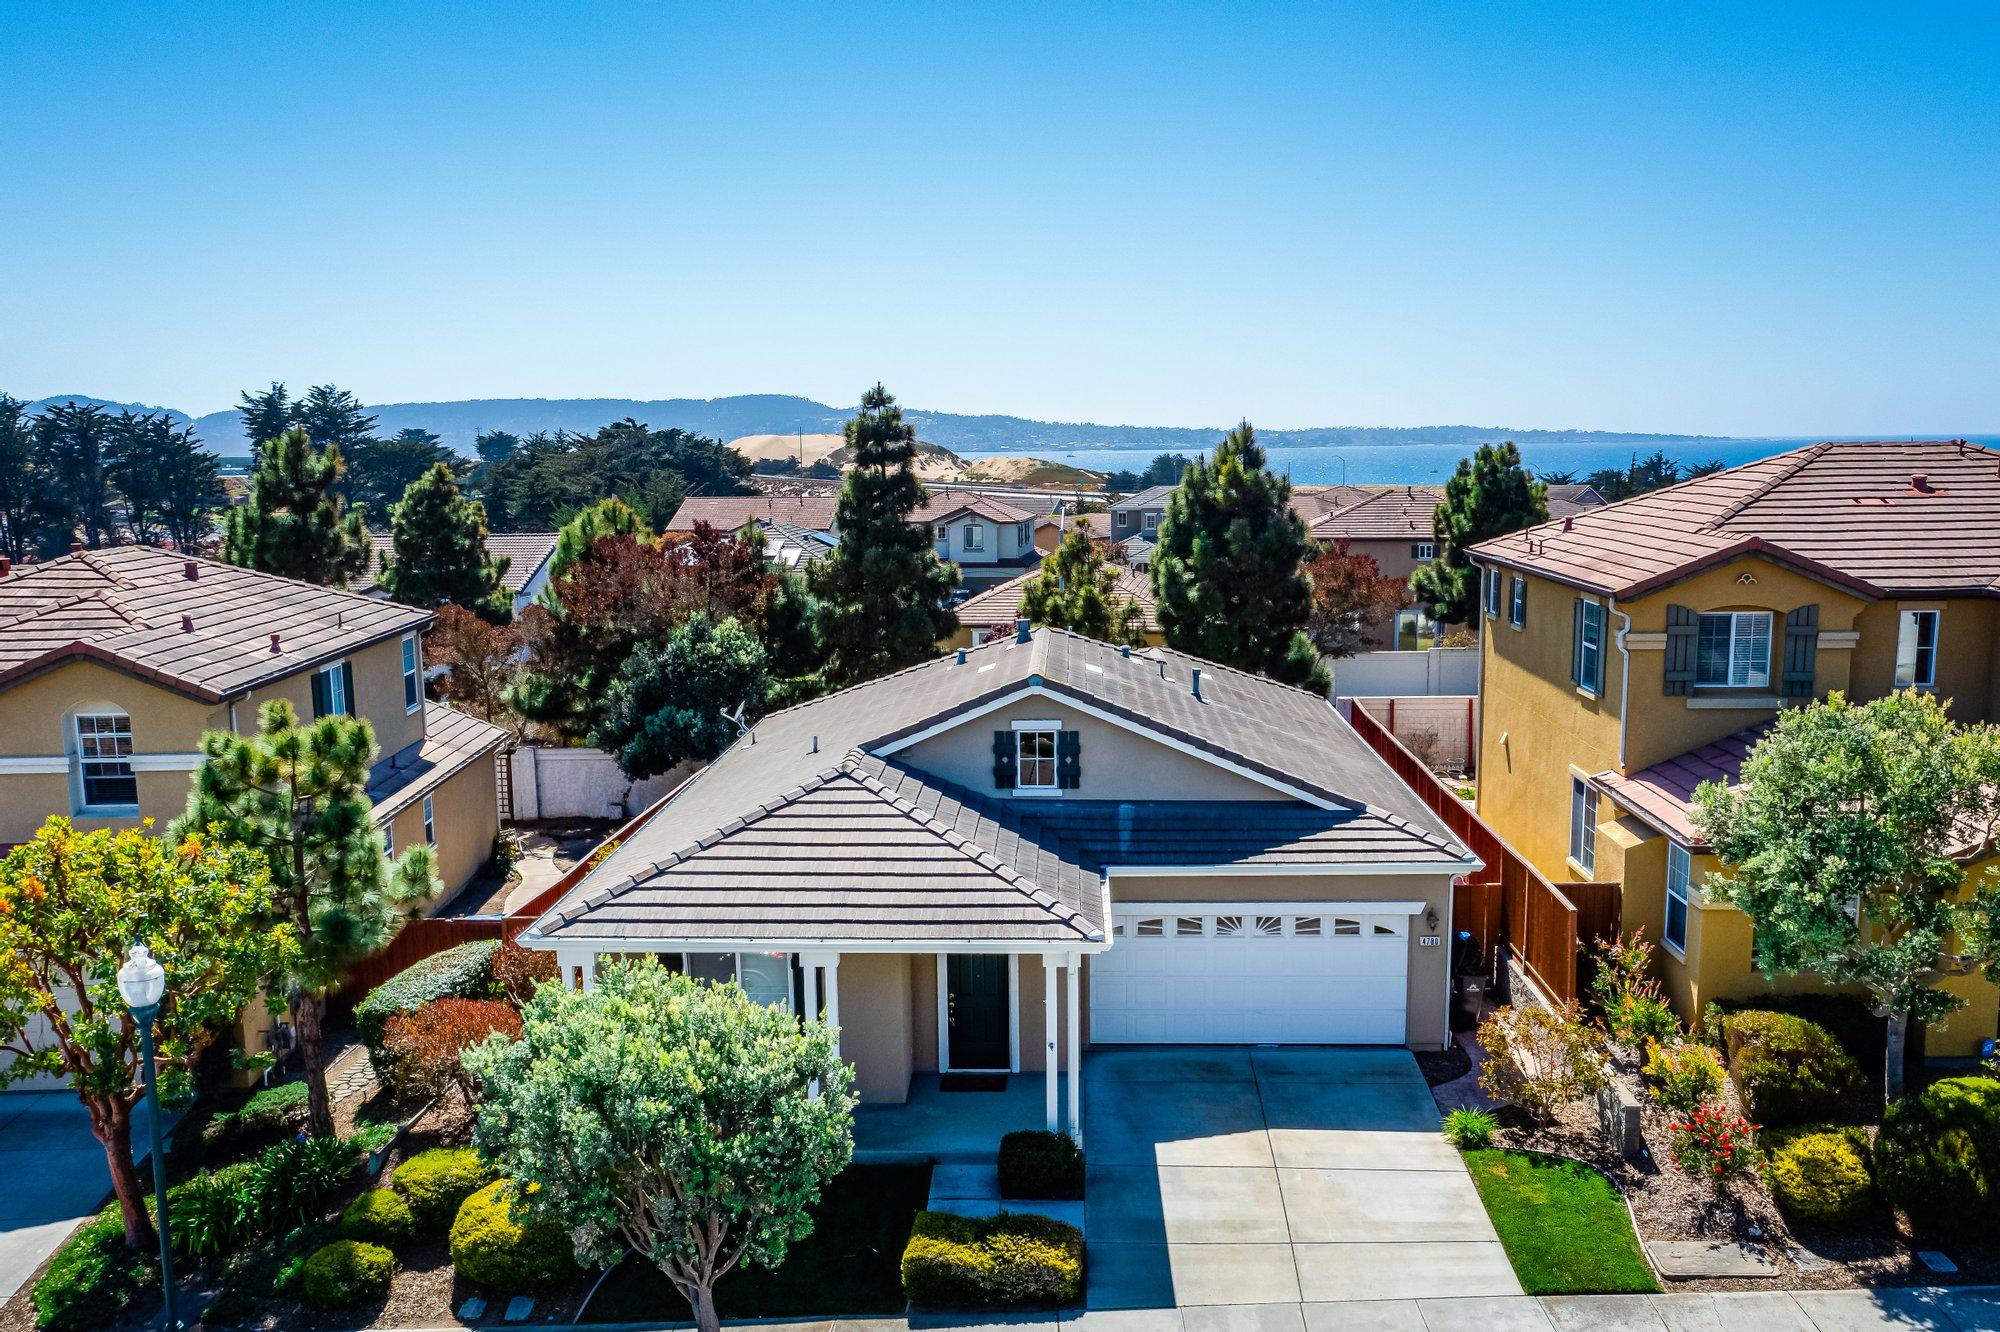 Casa a Sand City, California, Stati Uniti 1 - 11444858